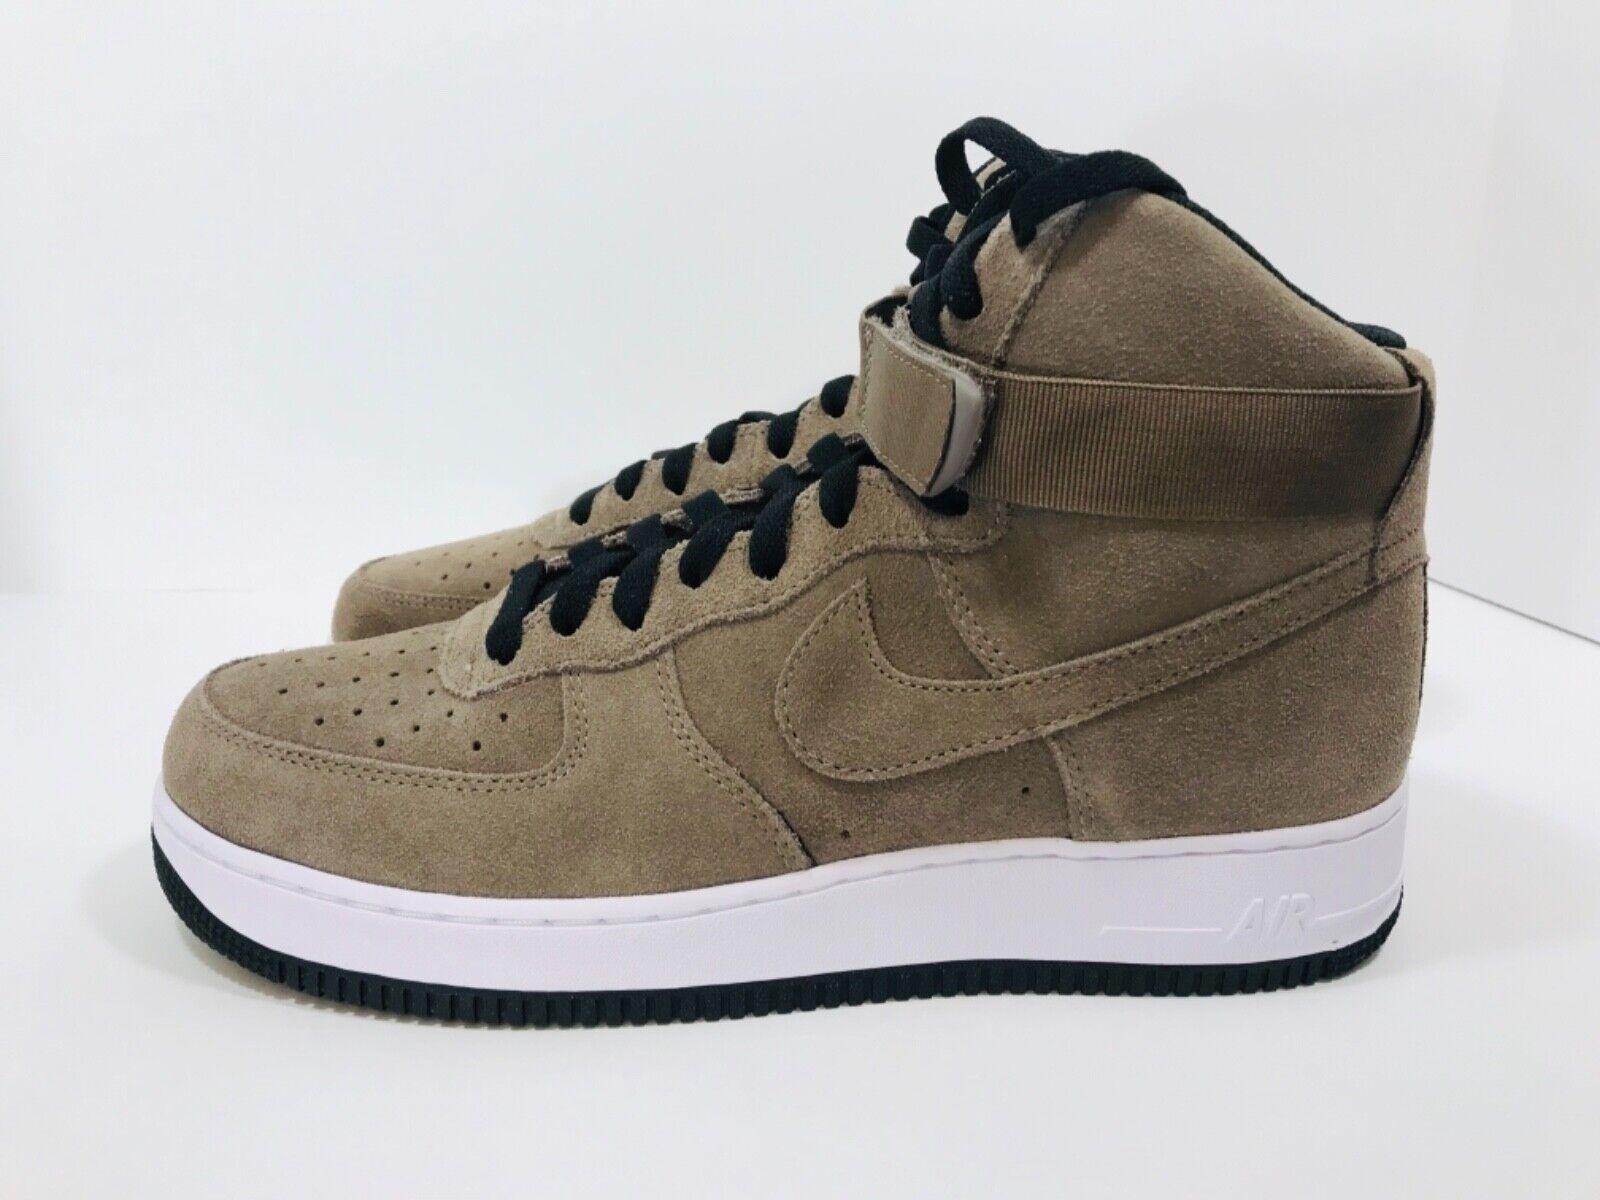 brand new e1ef5 4dbdd New Nike Air Force 1 High  07  07  07 Men s Size 10 Mushroom